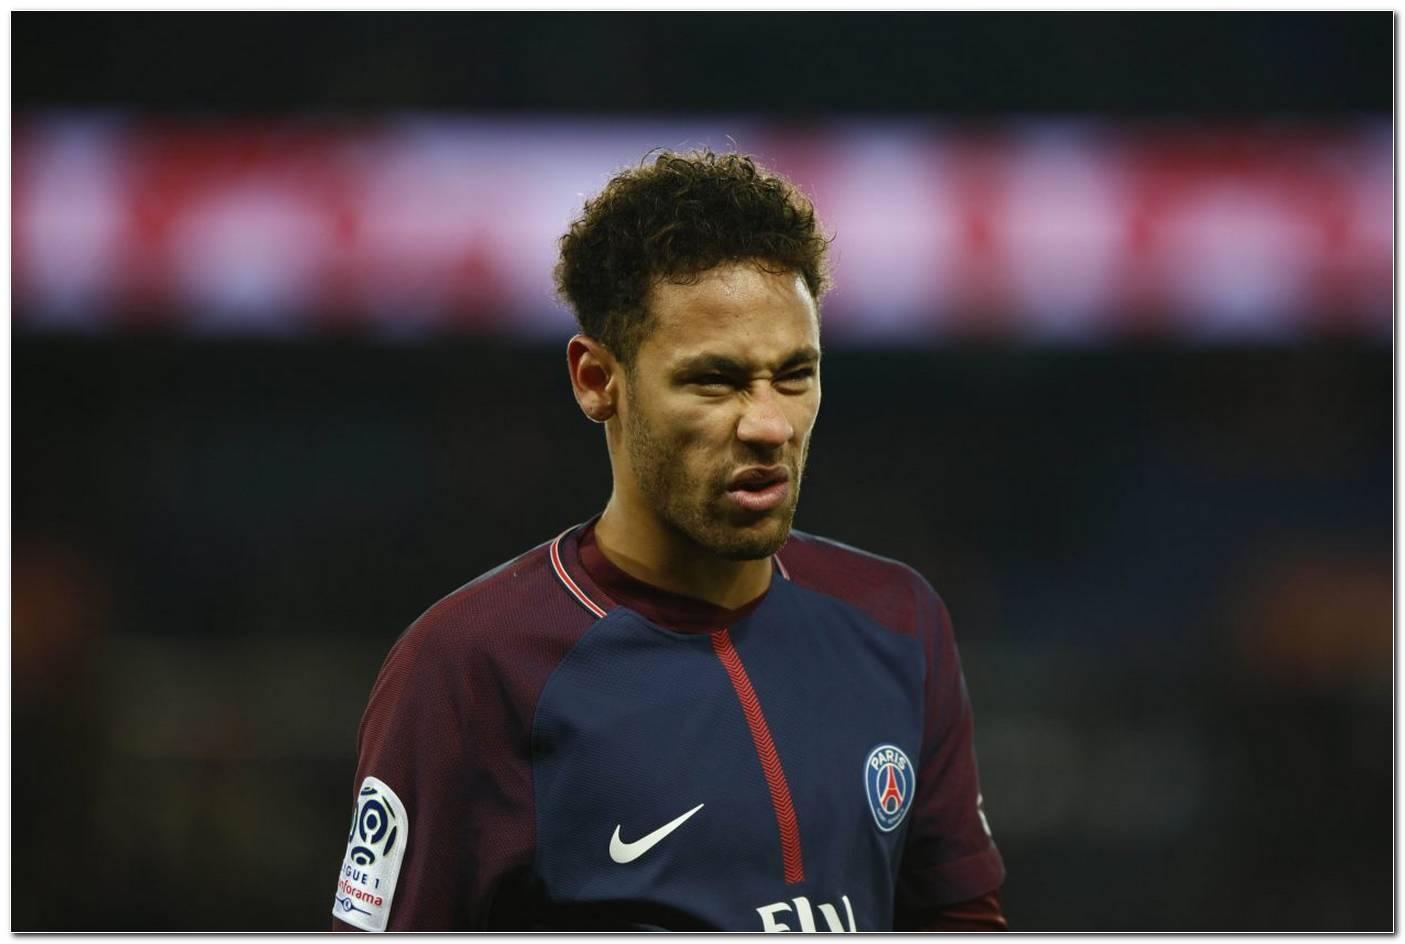 Neymar Frisur 2017